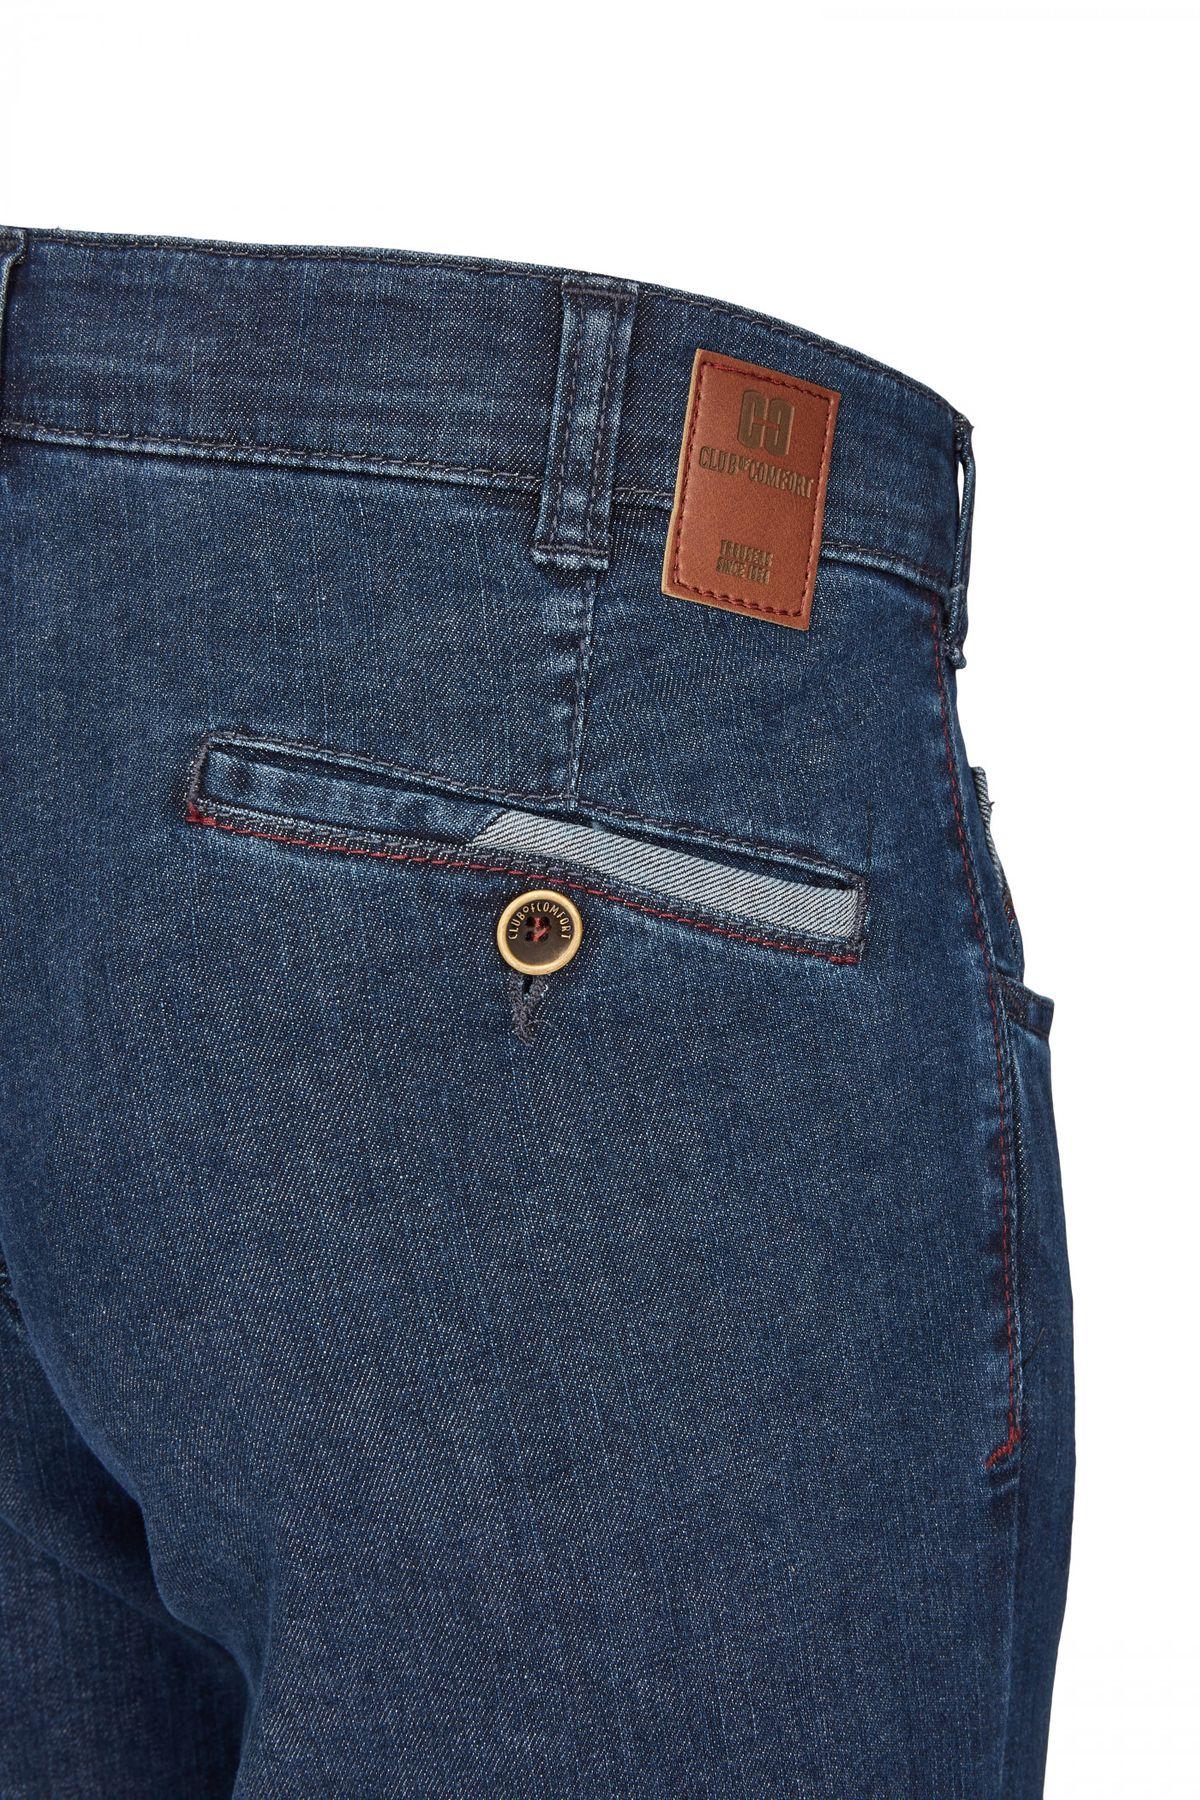 Club of Comfort - Herren Five-Pocket-Hose, Henry mit Thermolite (6822) – Bild 14